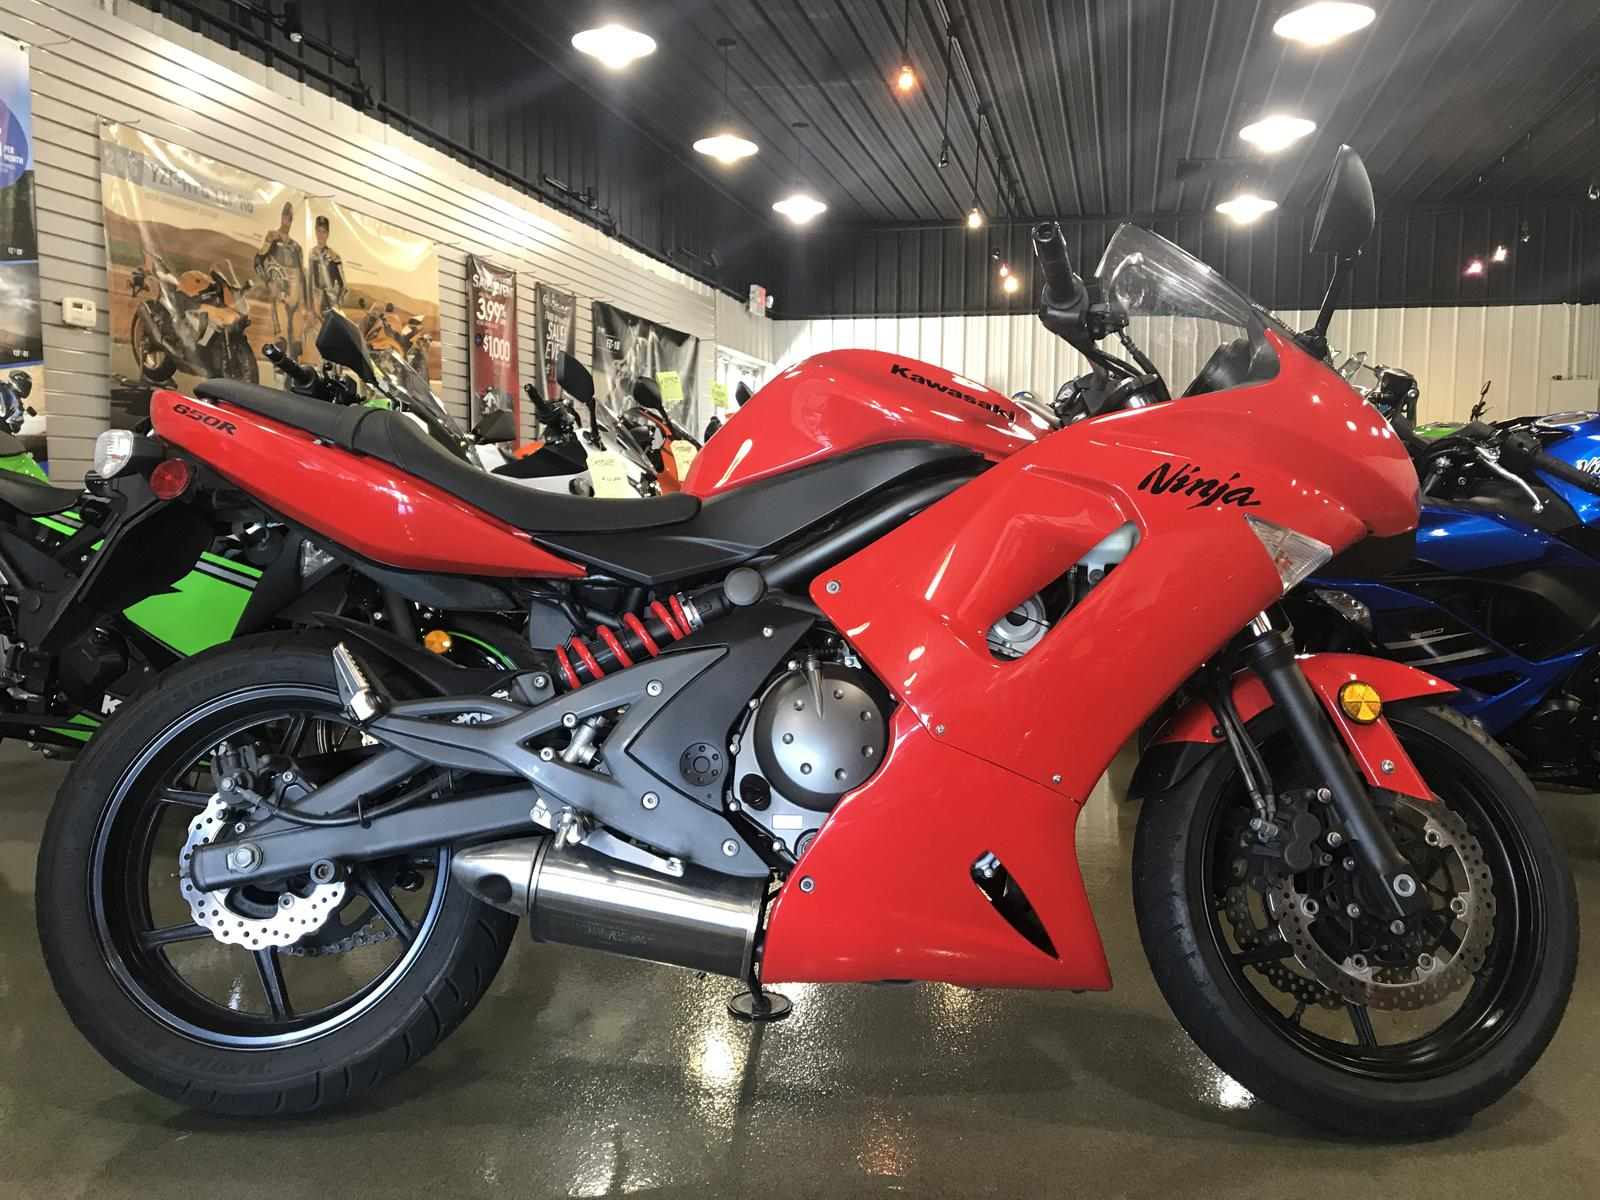 2008 Kawasaki Ninja 650r For Sale In Urbana Il Sportland